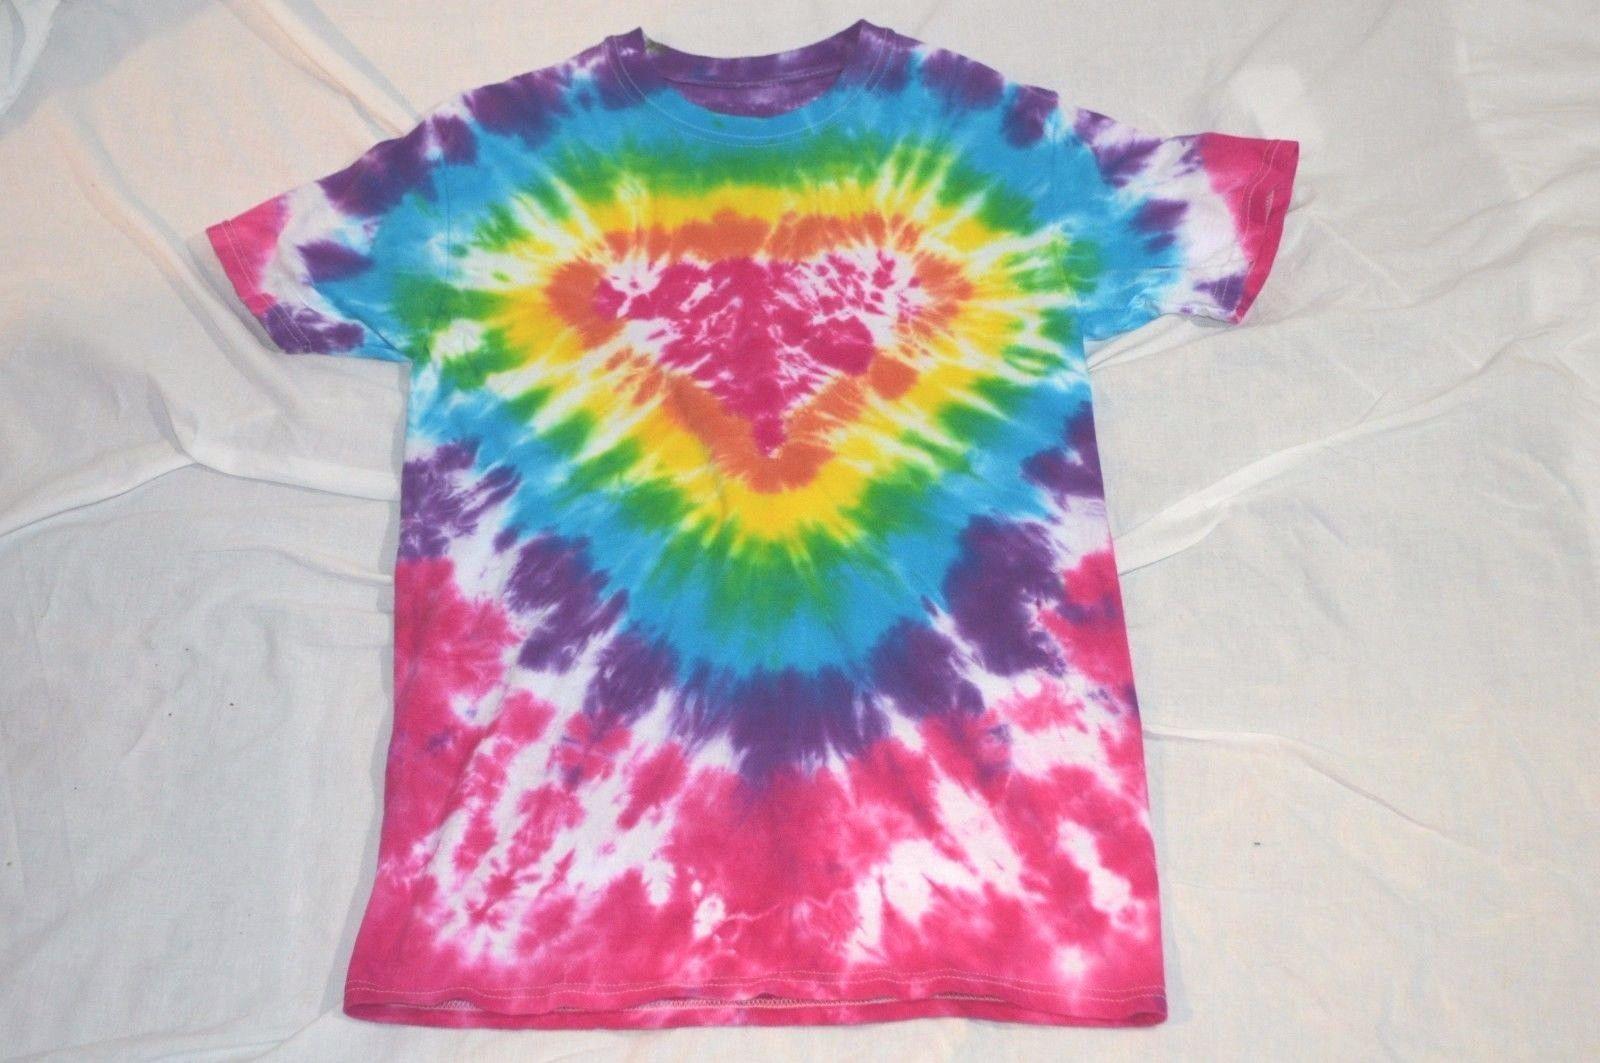 Tie Dye T Shirt Hand Dyed Tie Dye T Shirt Heart Boho Hippy Women's S, M Men's S Hippy Boho